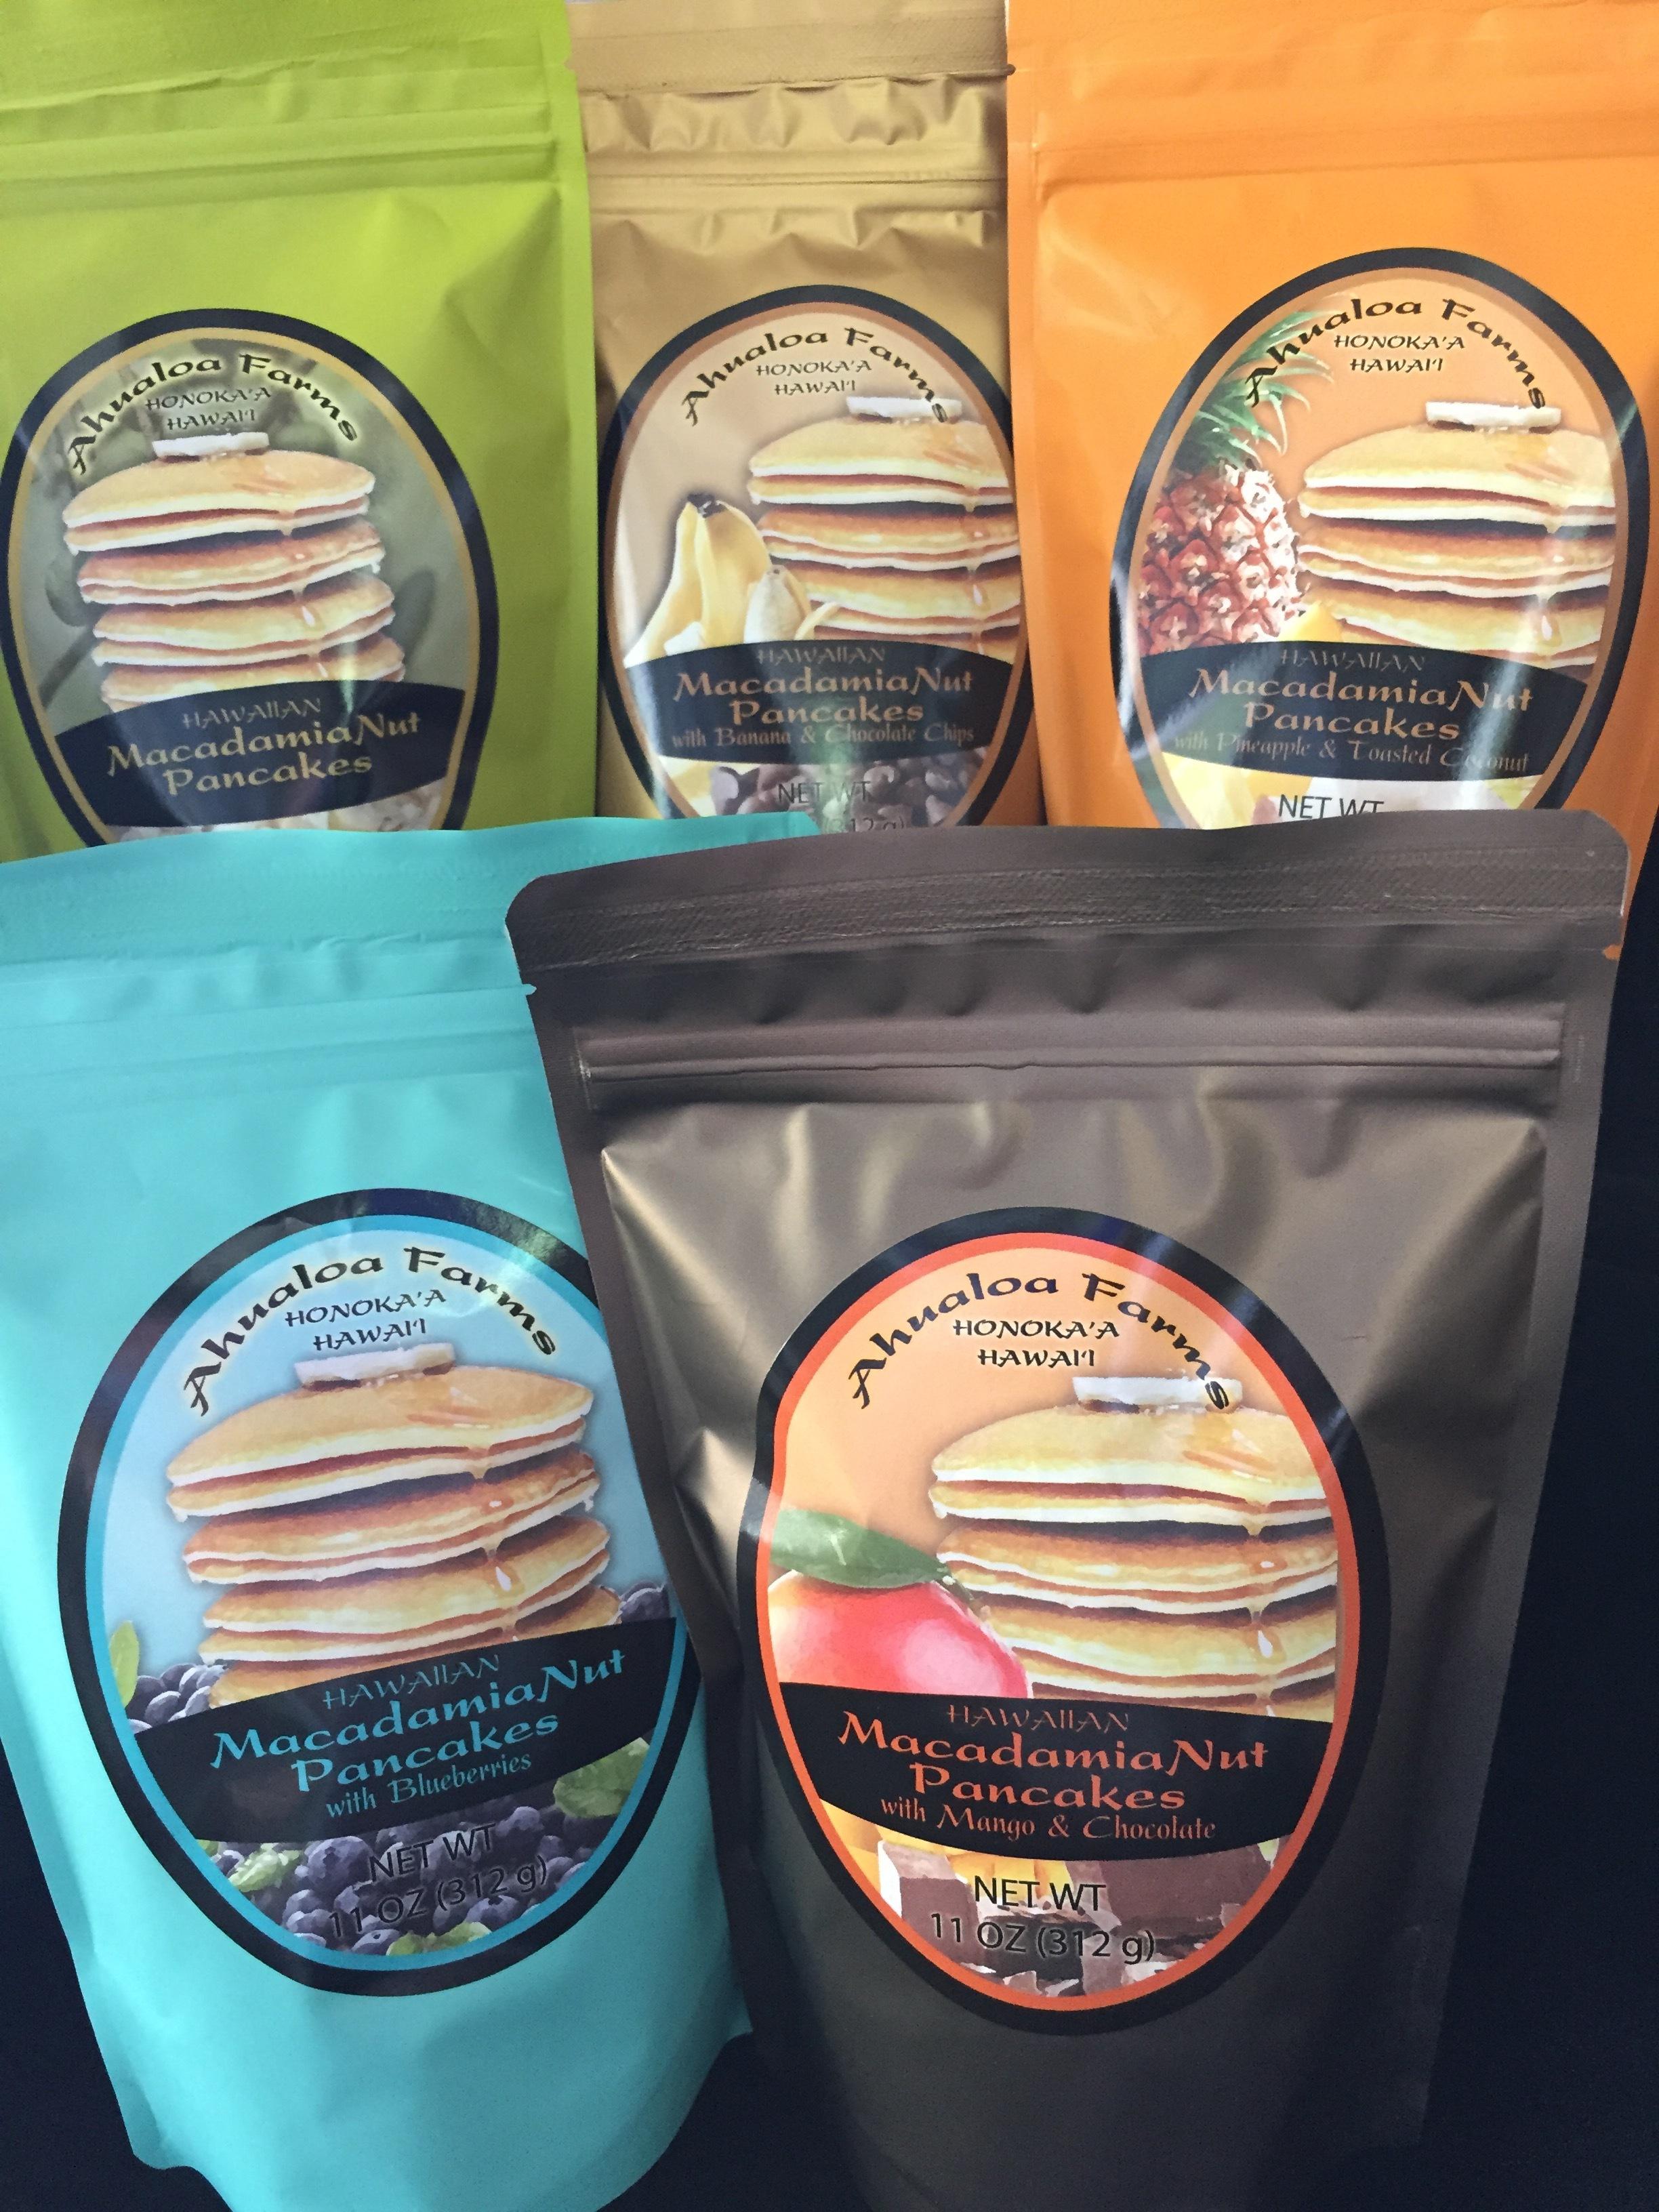 Hawaiian Macadamia Nut Pancake Mixes 00126